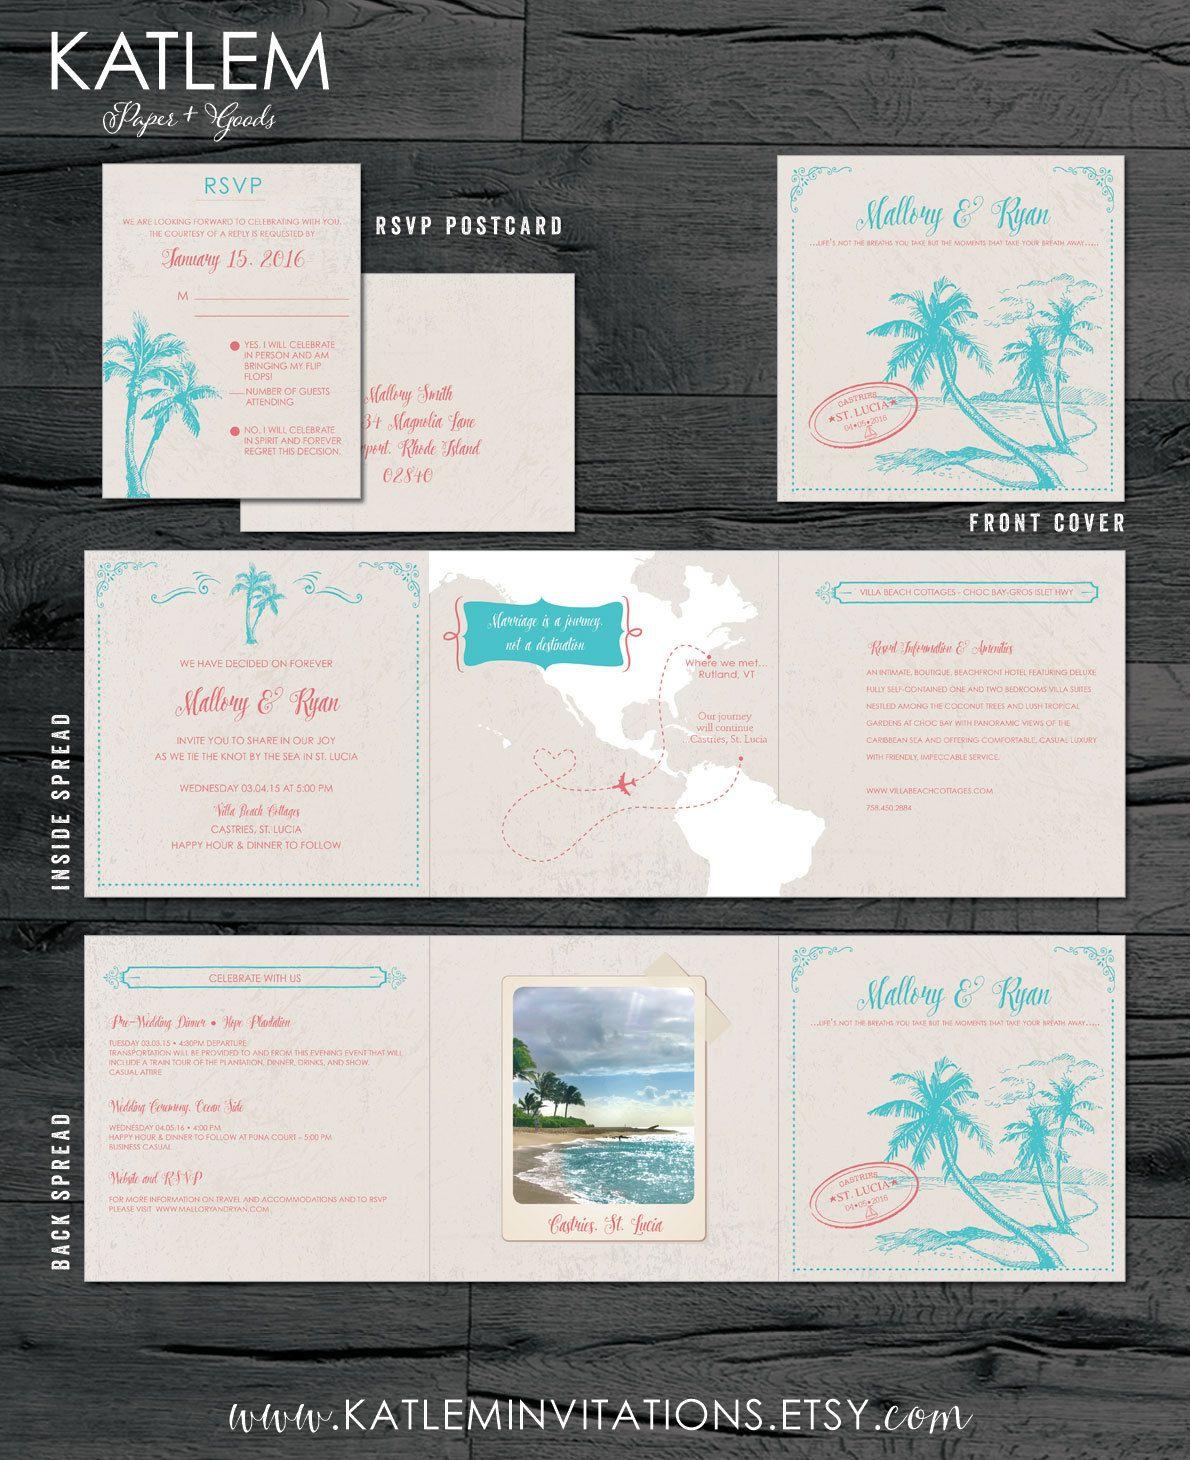 St Lucia Destination Wedding Invitation